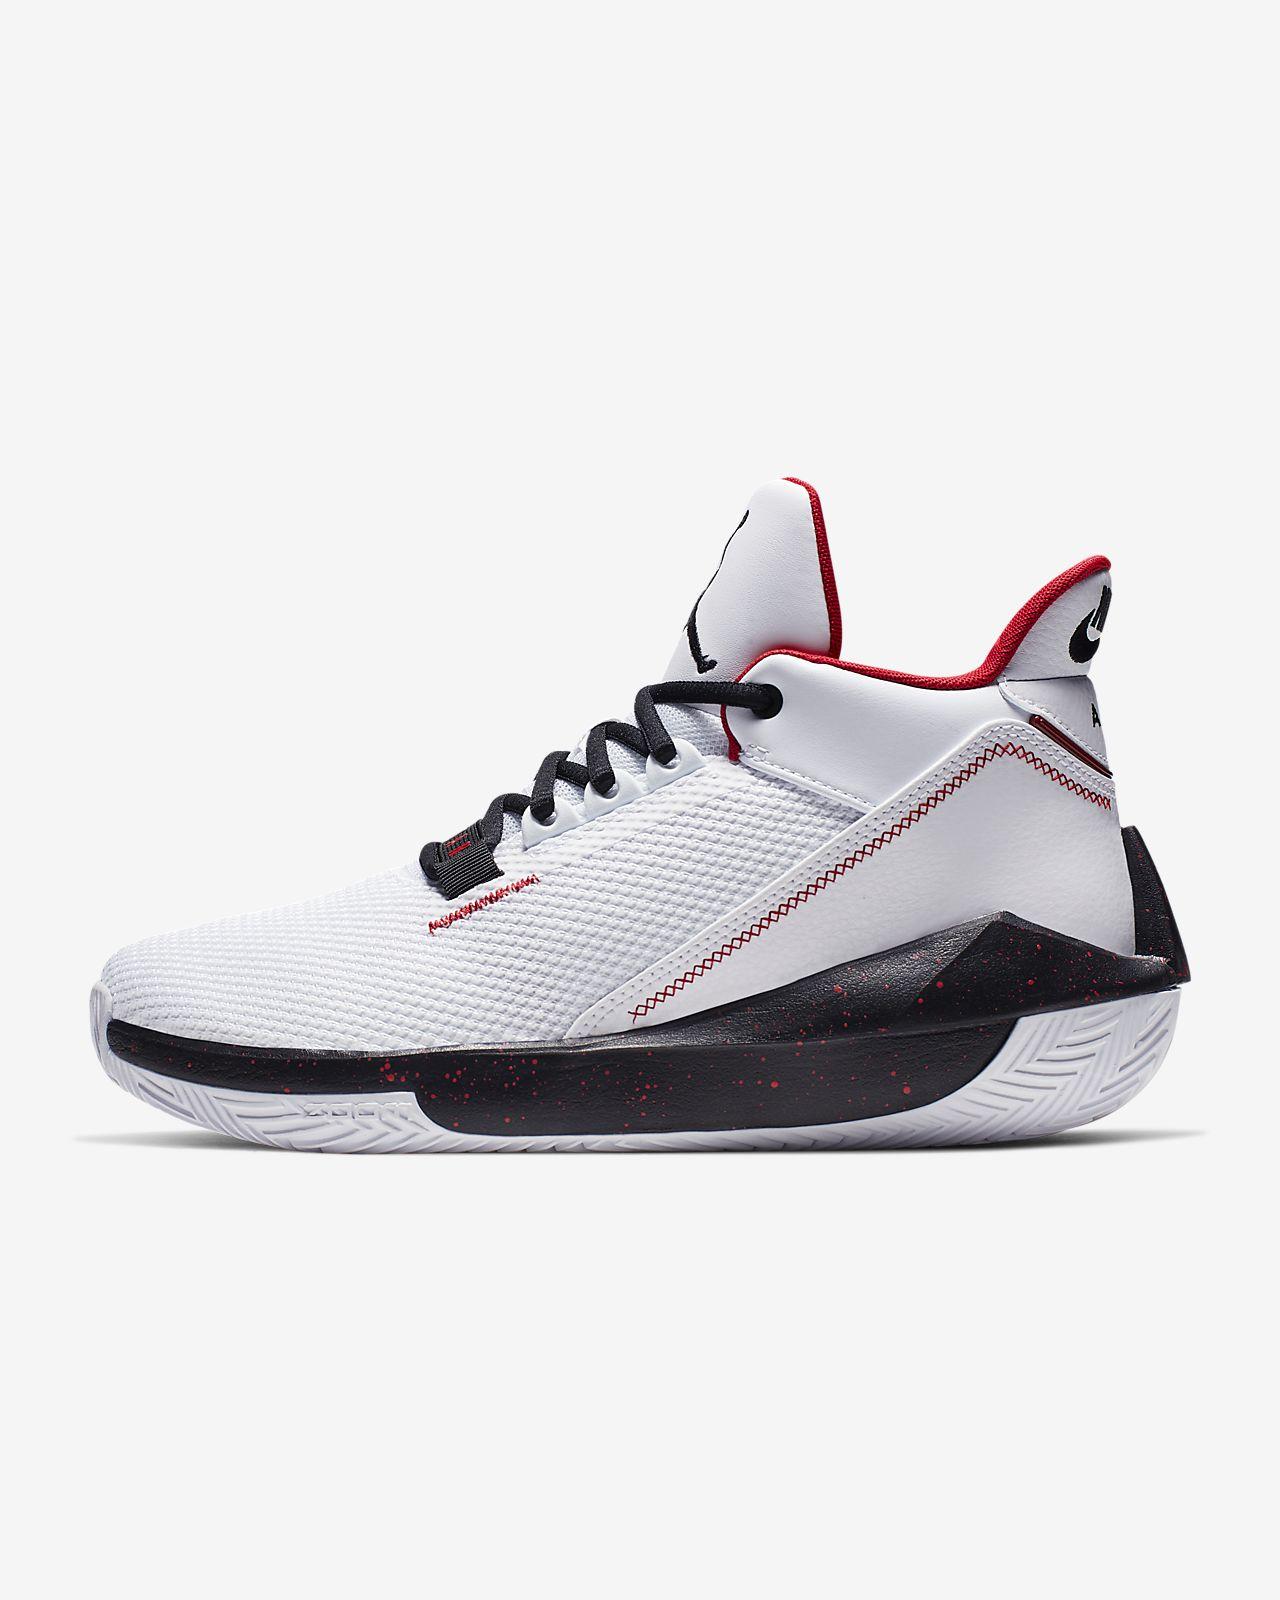 Jordan 2x3 Basketball Shoe